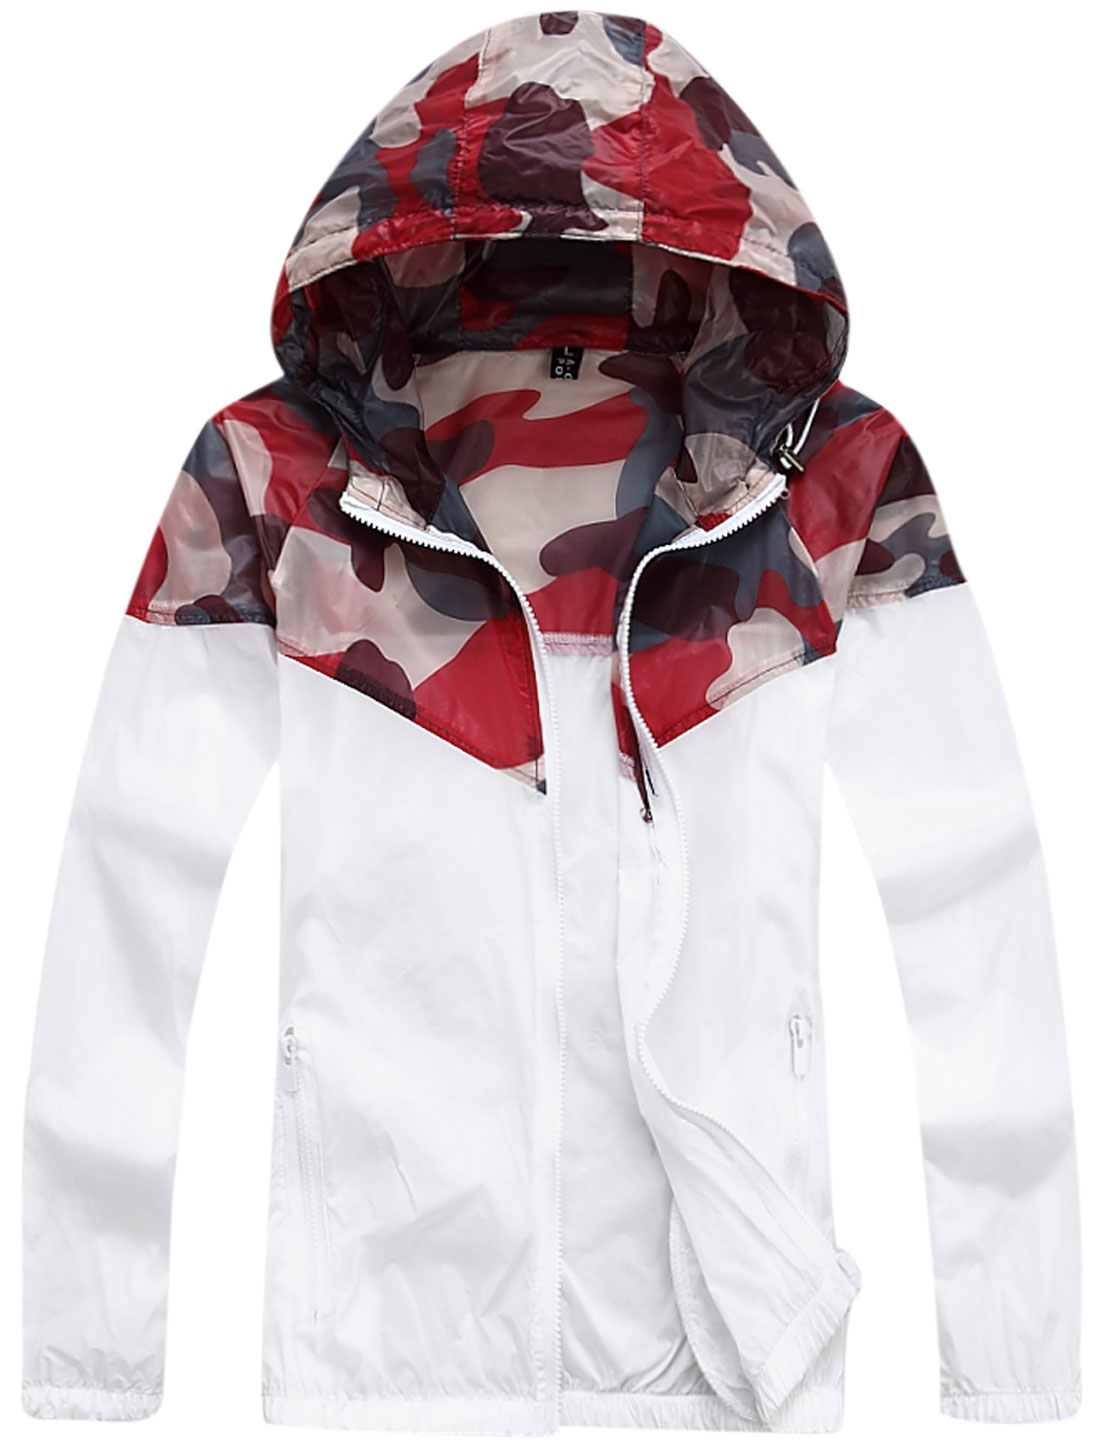 Men Zip Up Camouflage Pattern Thin Hooded Jacket w Pocket White M